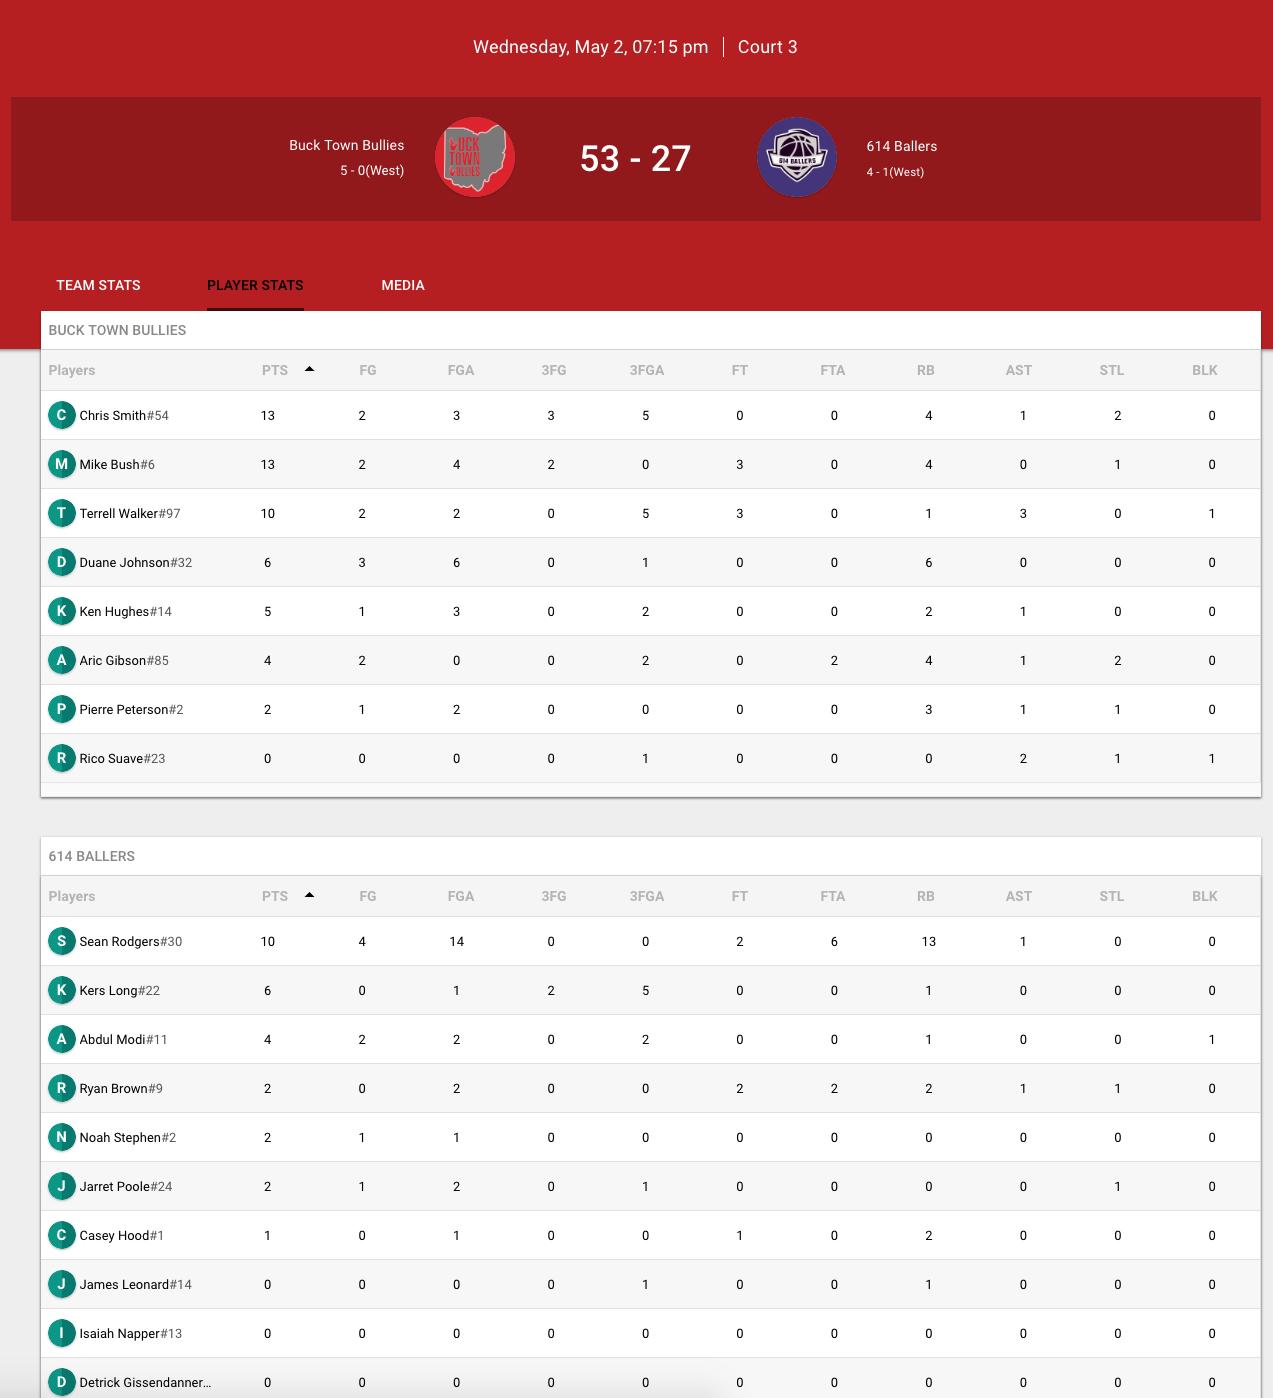 Box Score  - Team Totals, Player Recap